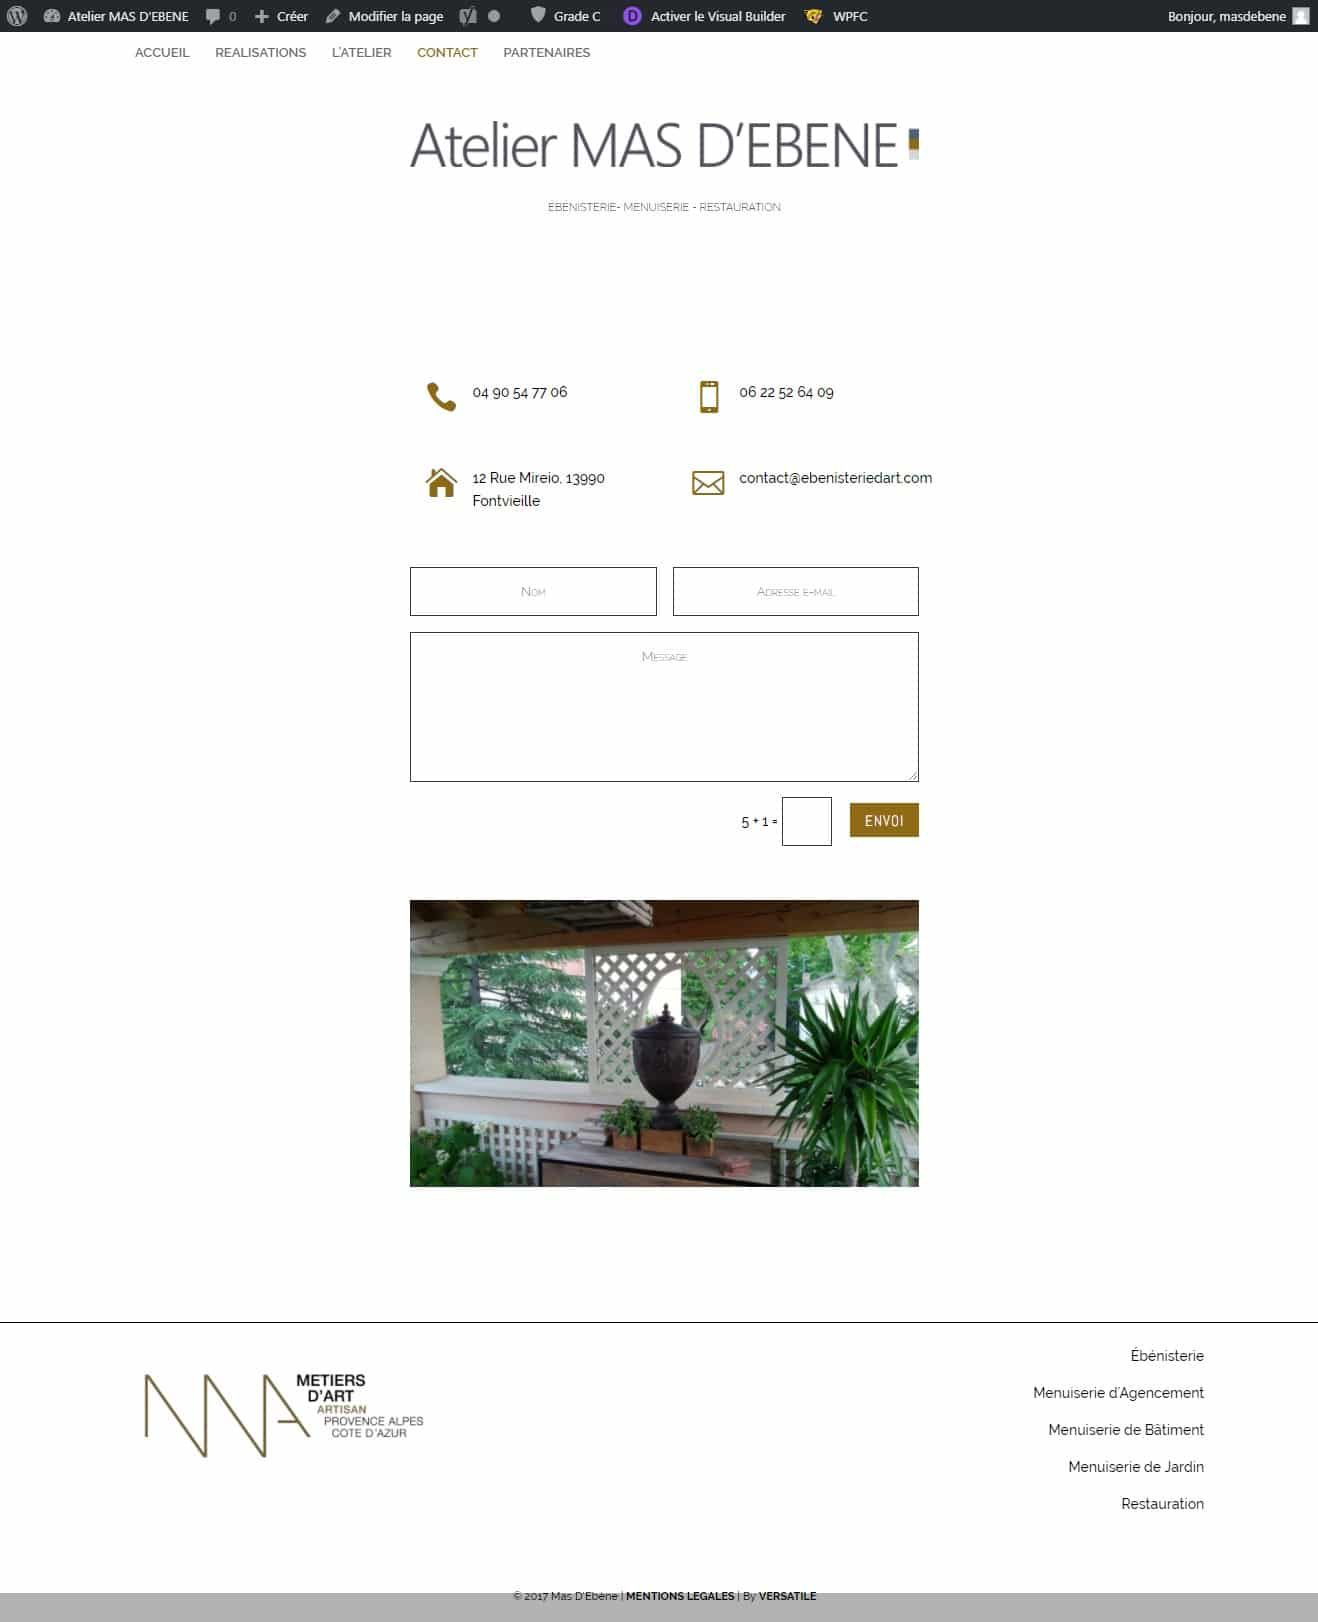 Contact Atelier MAS D'EBENE